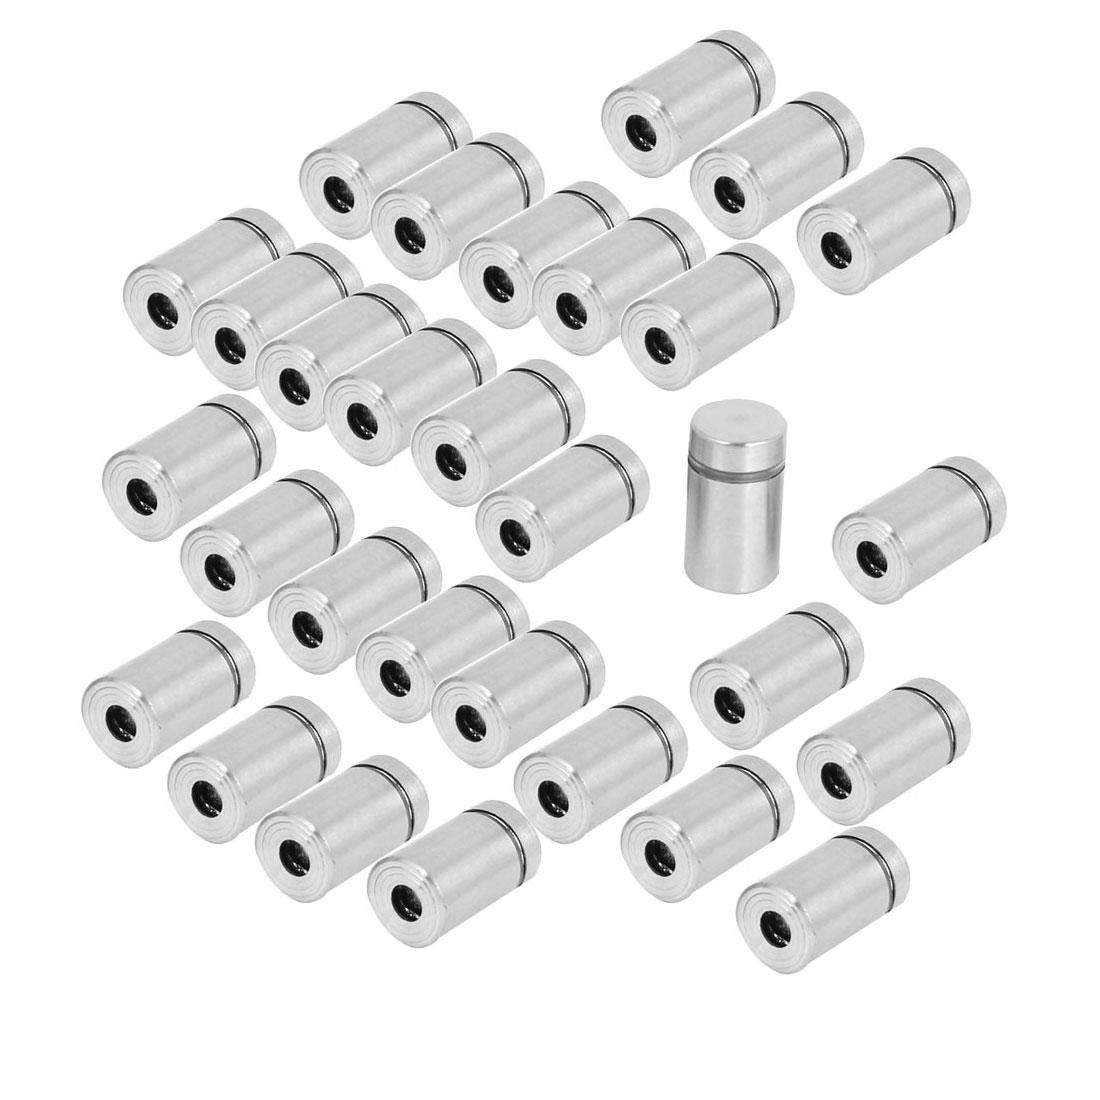 30 Pcs Stainless Steel Advertisement Fixing Screws Glass Standoff Pins 12mmx20mm